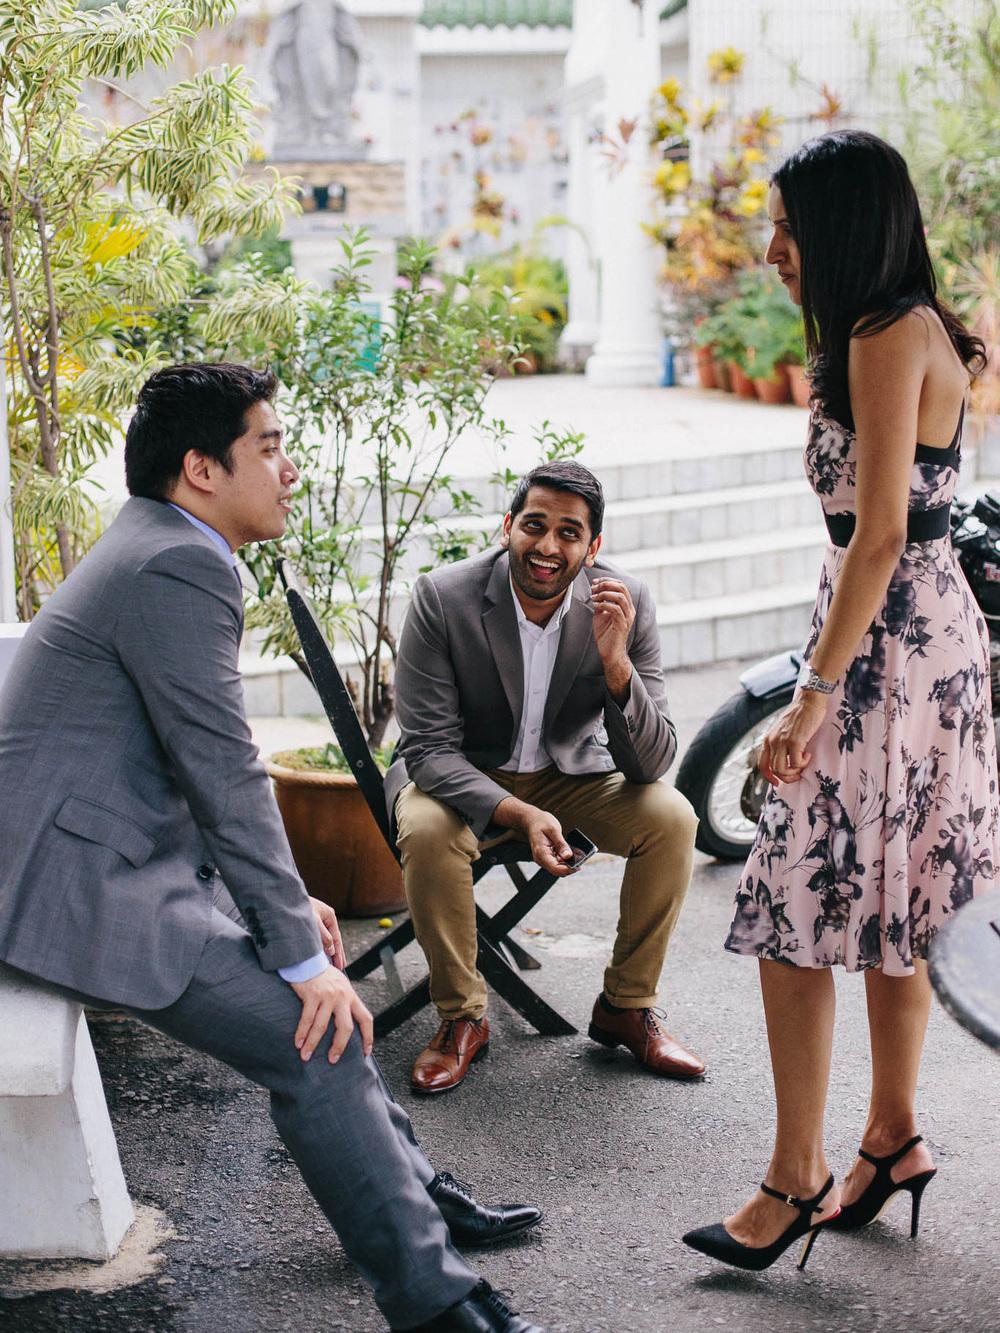 singapore-wedding-photographer-malay-indian-pre-wedding-travel-wmt-2015-jeremy-larissa-61.jpg